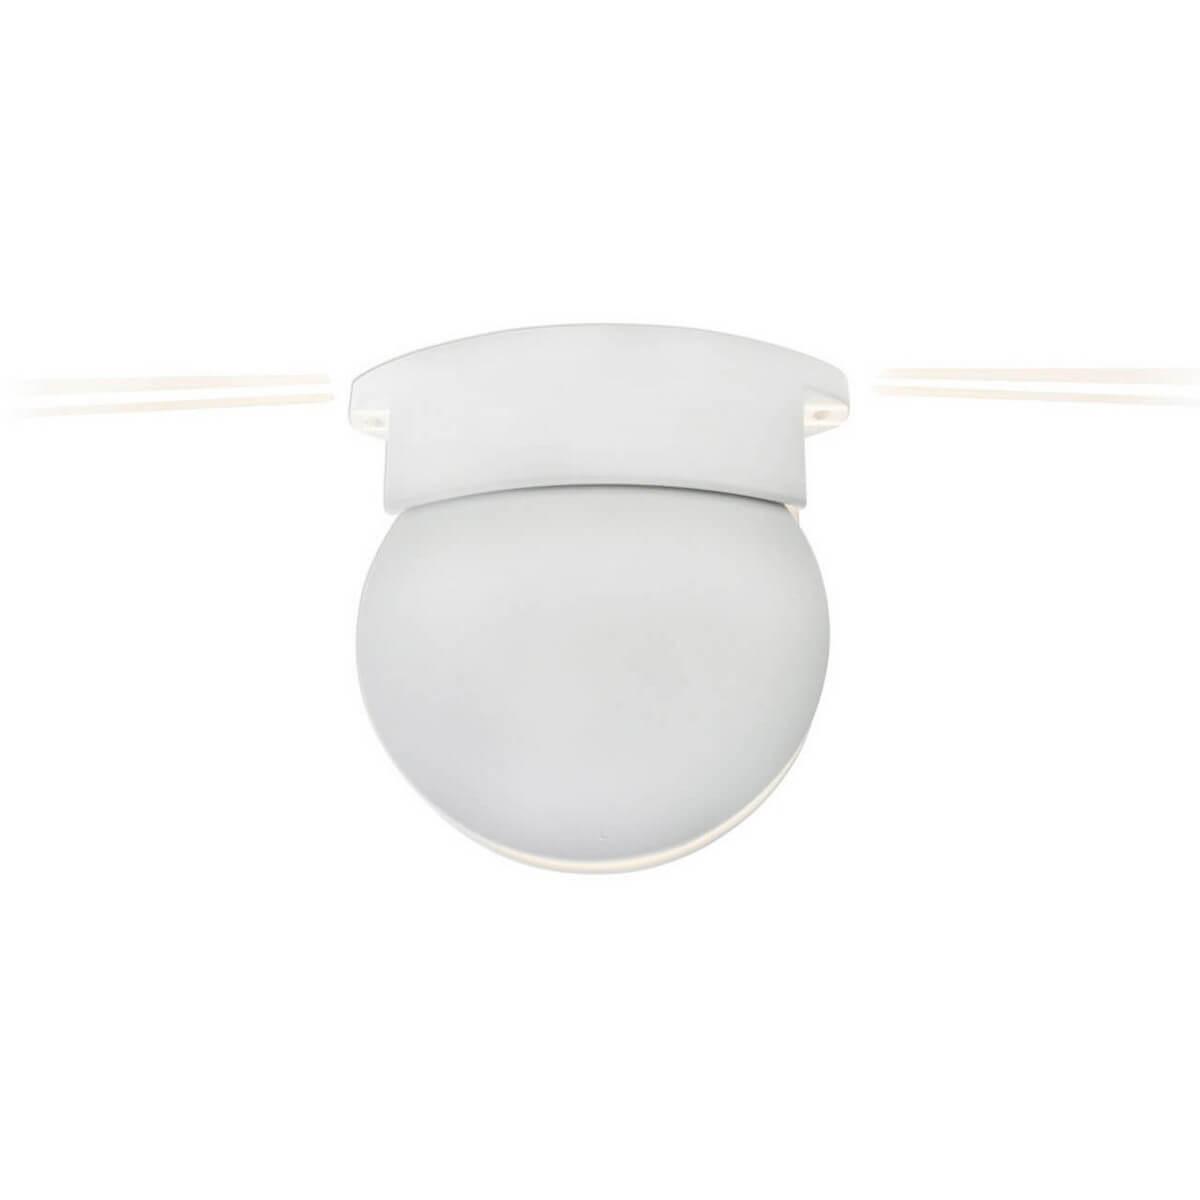 Светильник Kink Light 08579,01 Ореон